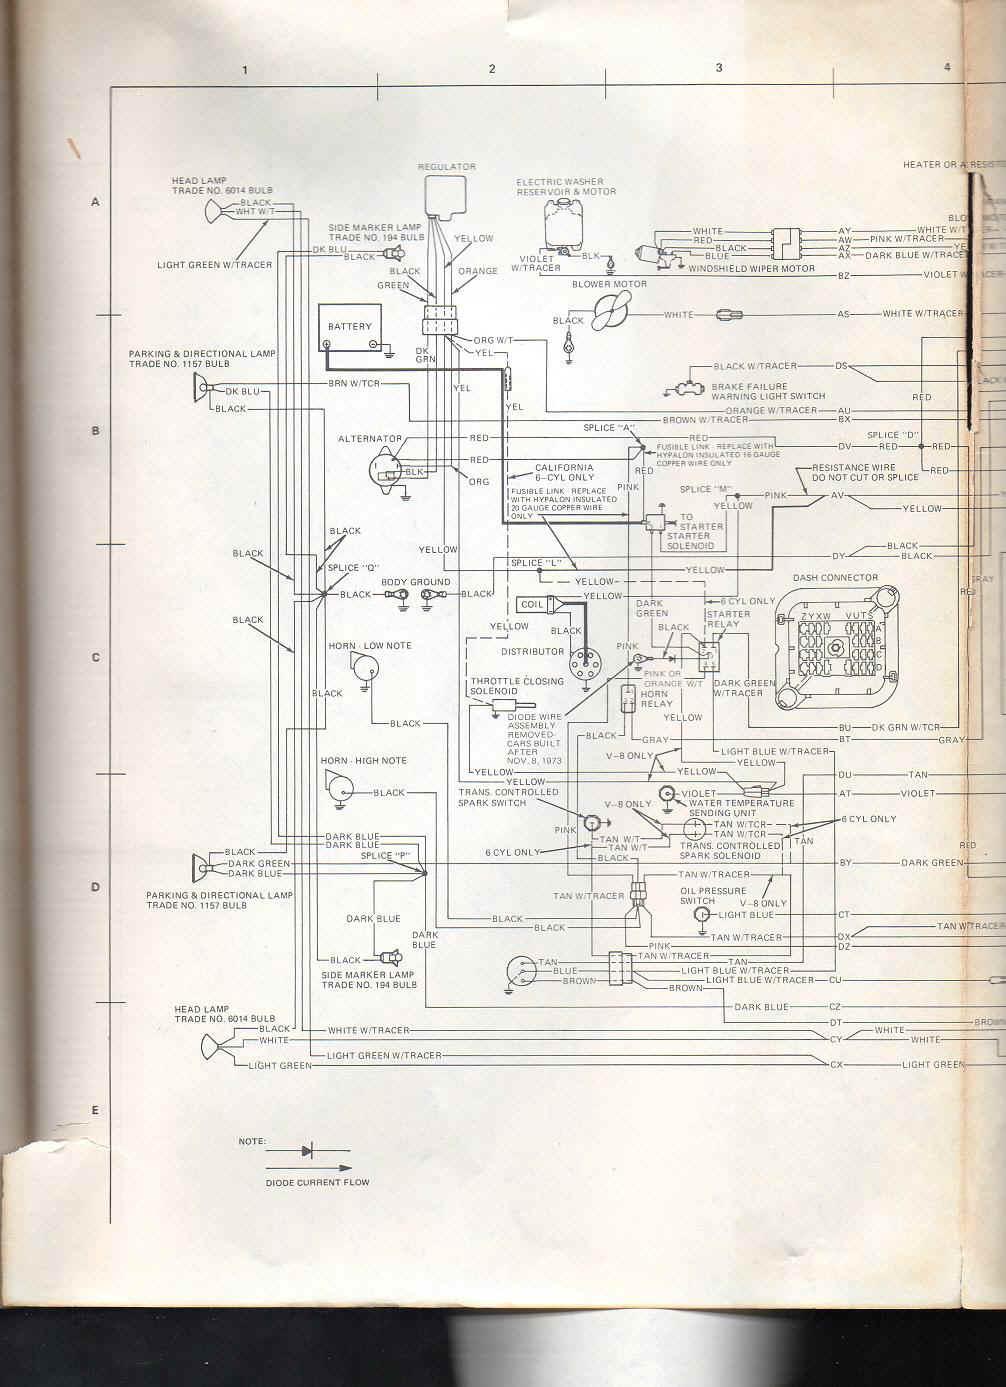 1968 javelin wiring diagram wiring diagram rh a17 frickeltante de  1968 amc amx wiring diagram